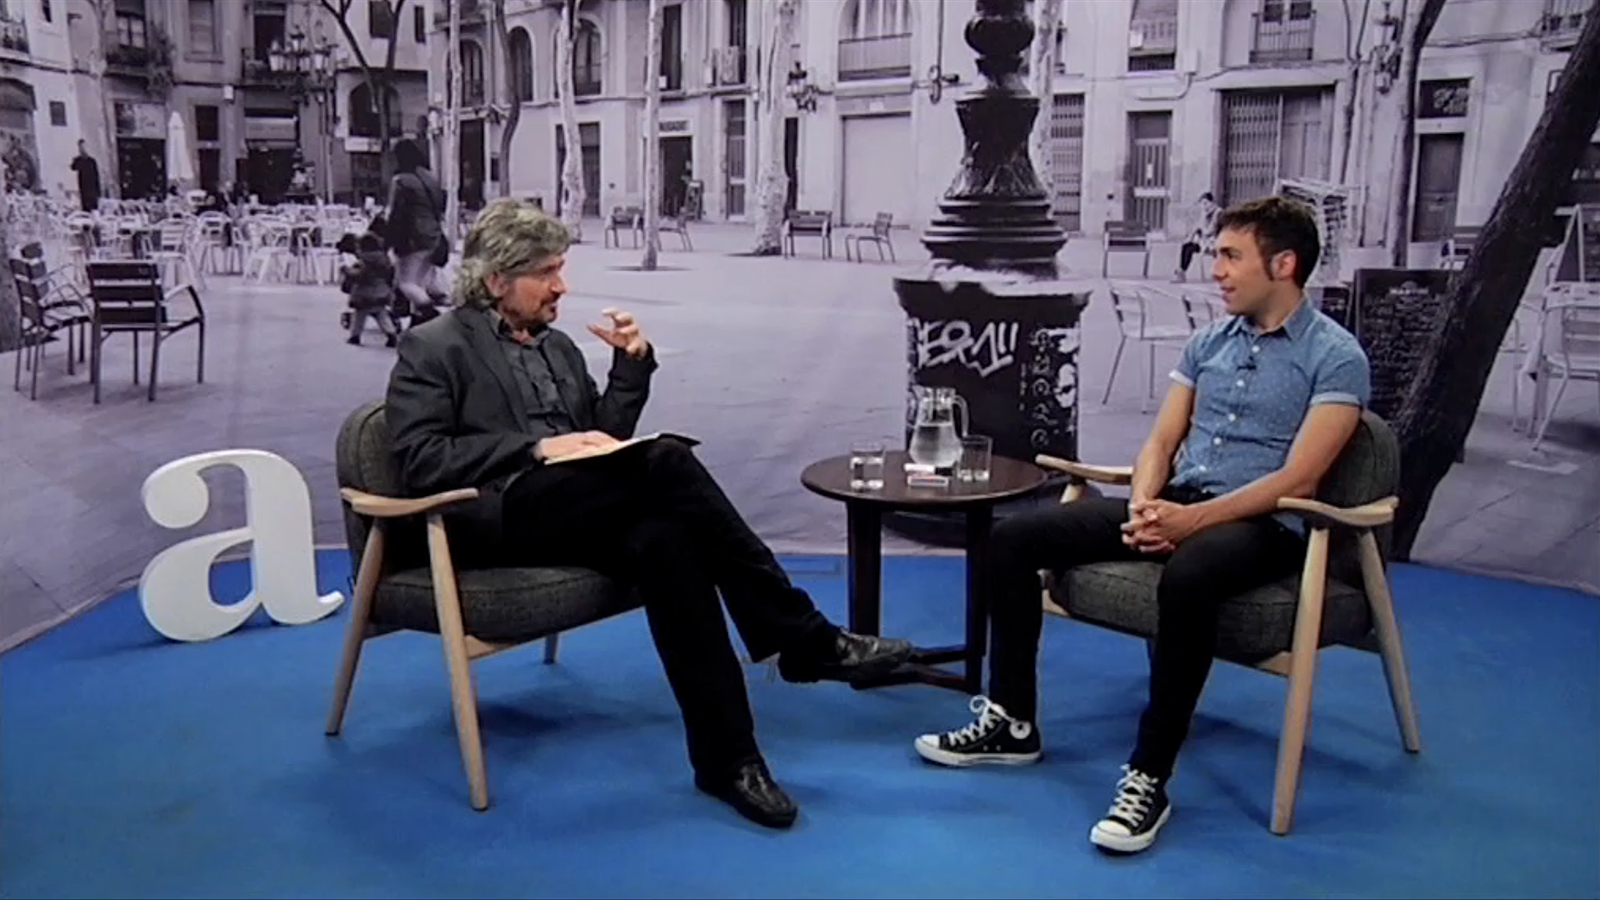 Entrevista de Carles Capdevila a Antonio Díaz